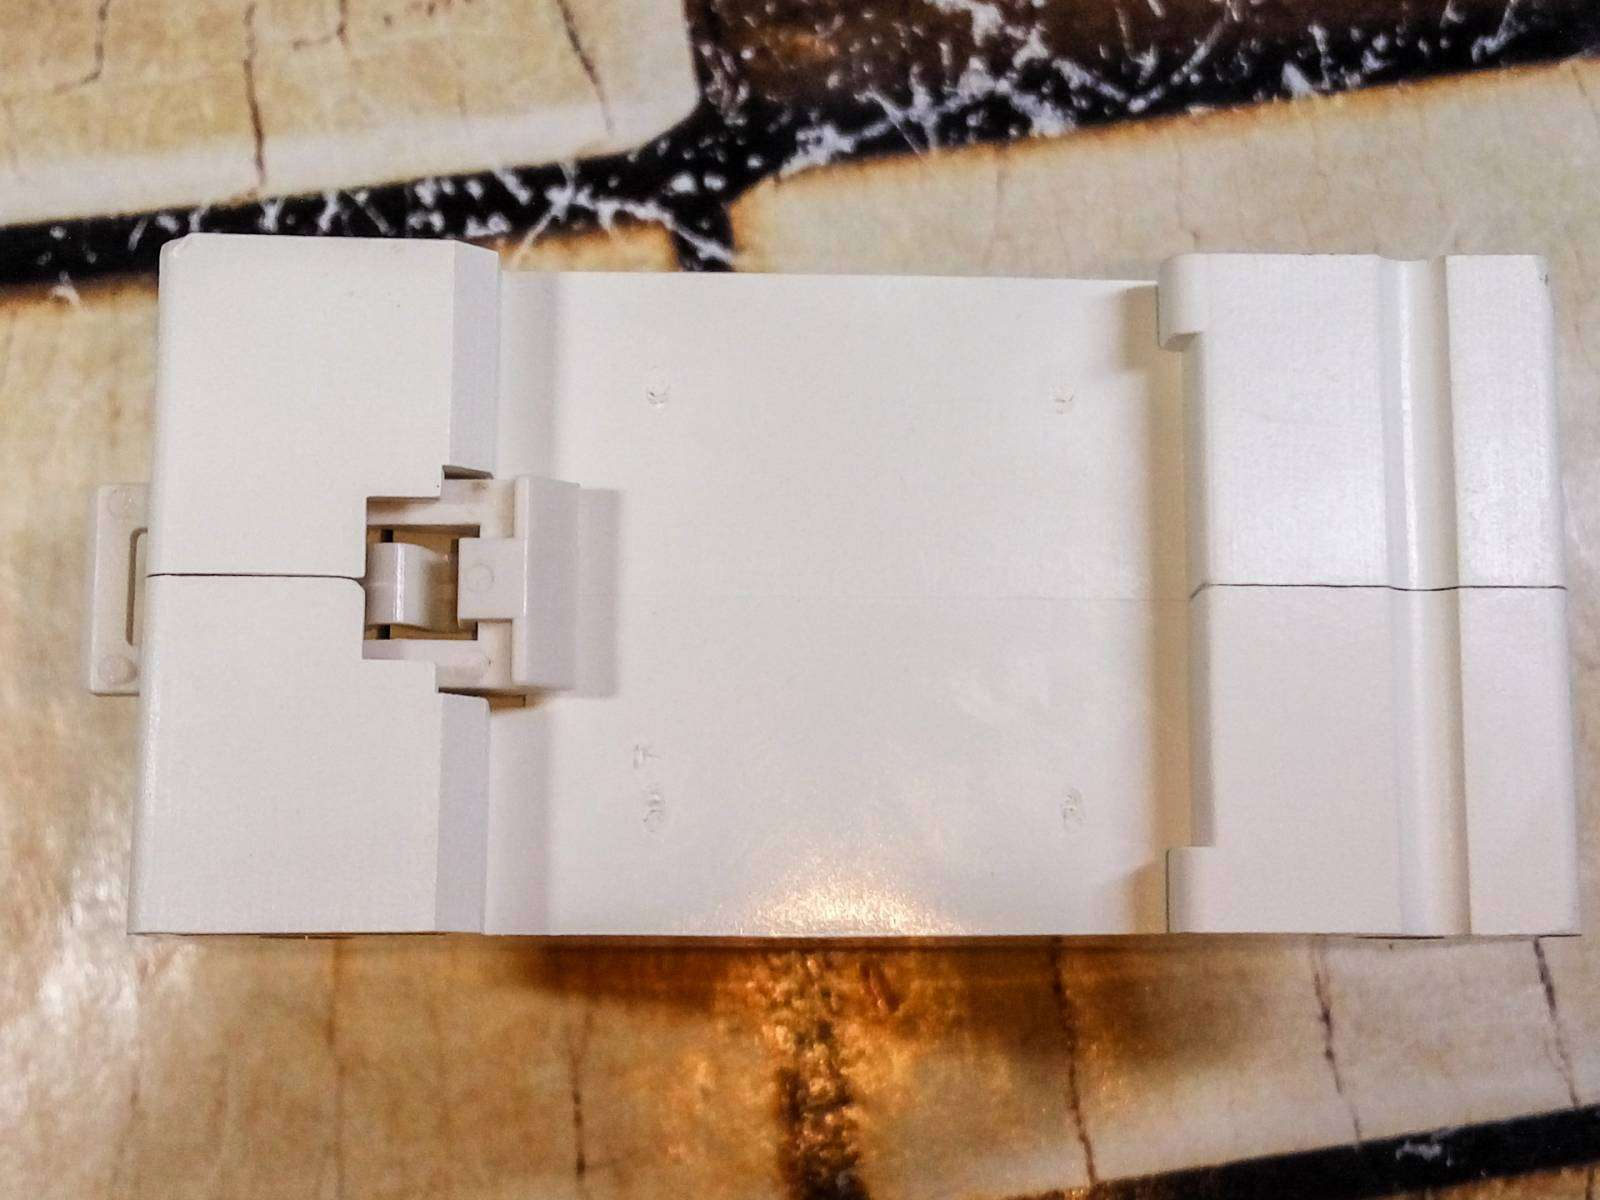 Aliexpress: Универсальная розетка с креплением на DIN рейку